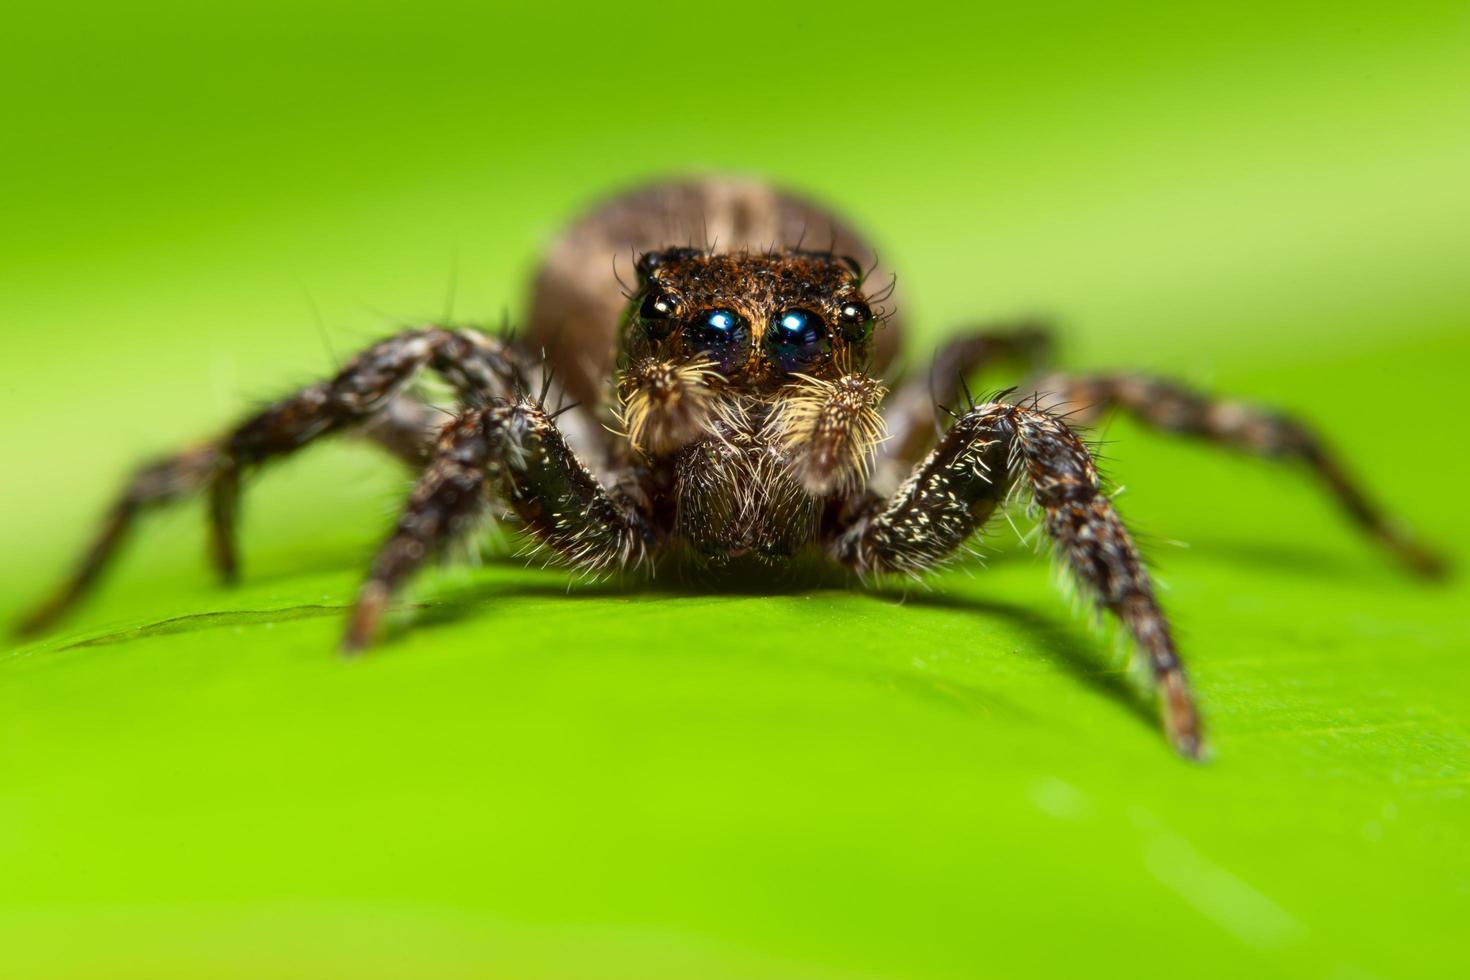 araignée macro sur une feuille verte photo